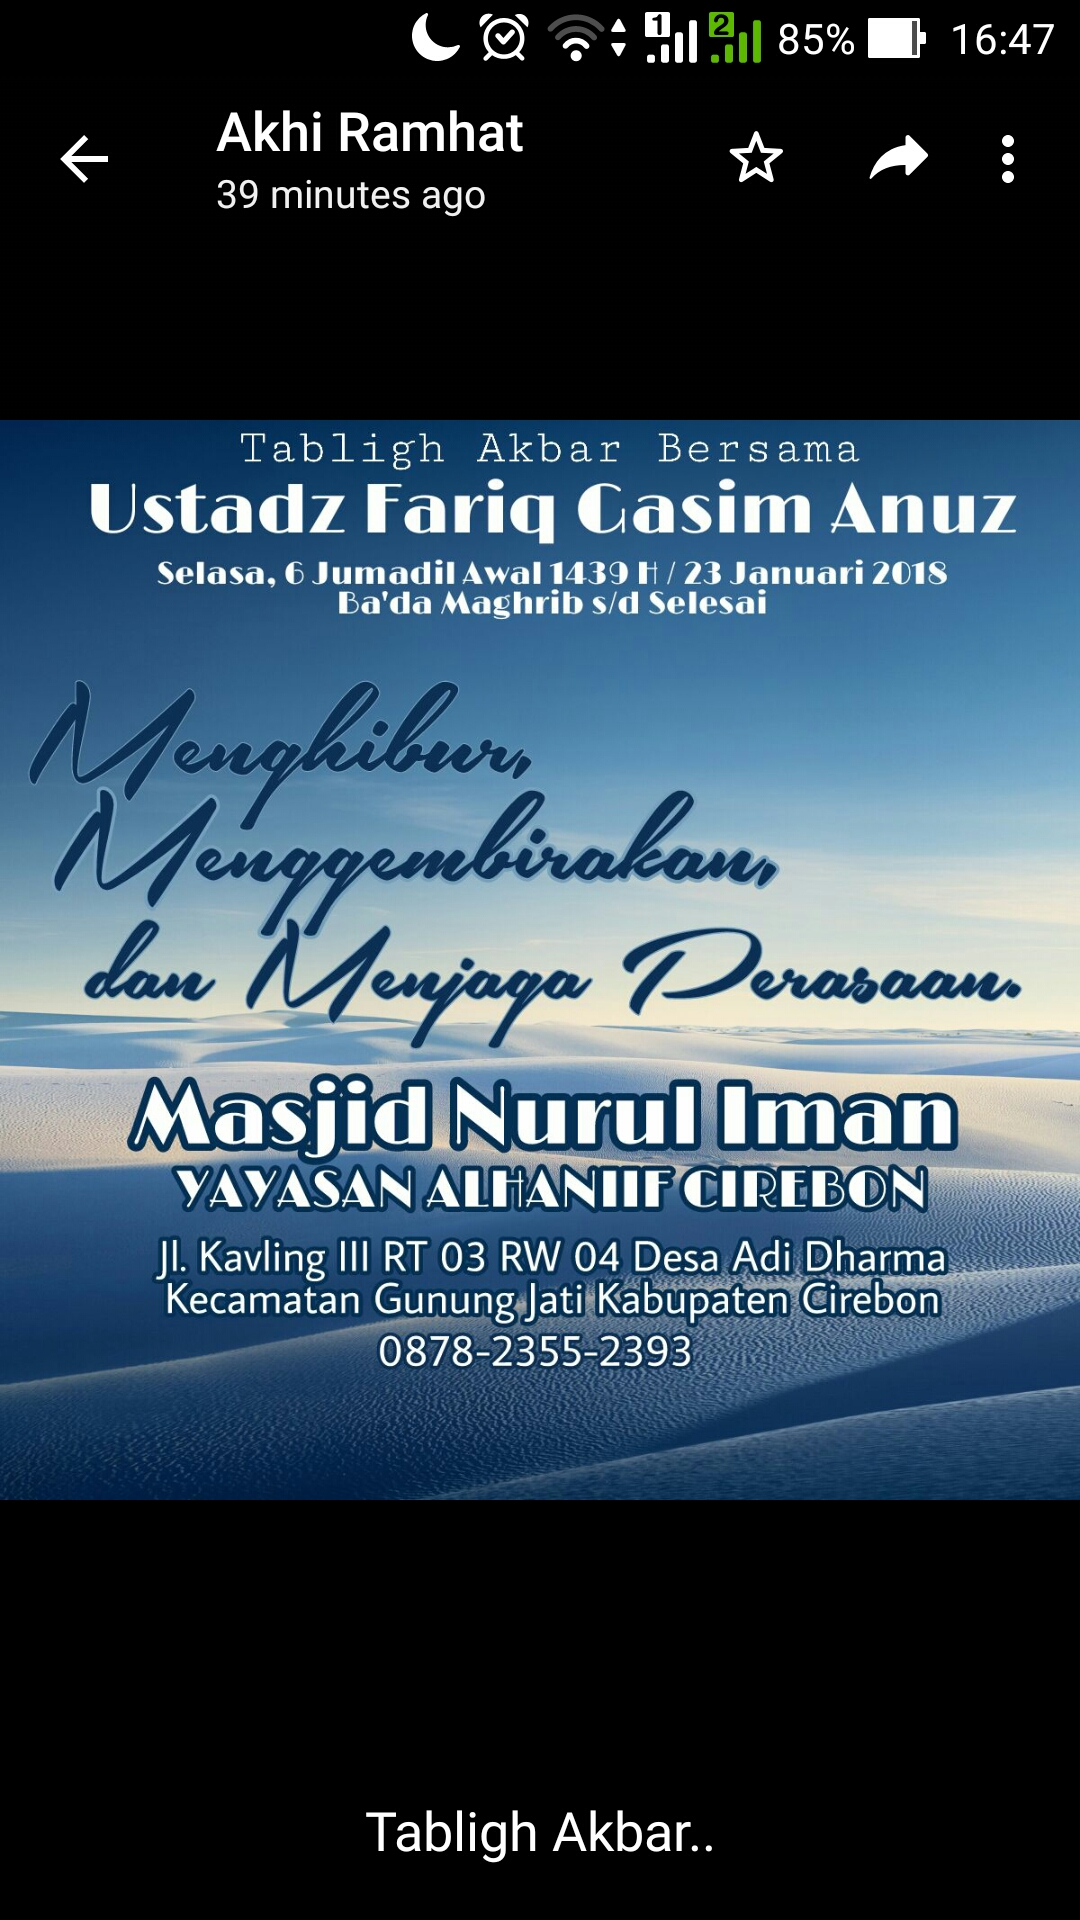 Tabligh Akbar Ustadz Fariq Gasim Anus – Menghibur Mengembirakan dan Menjaga Perasaan – Masjid Nurul Iman.